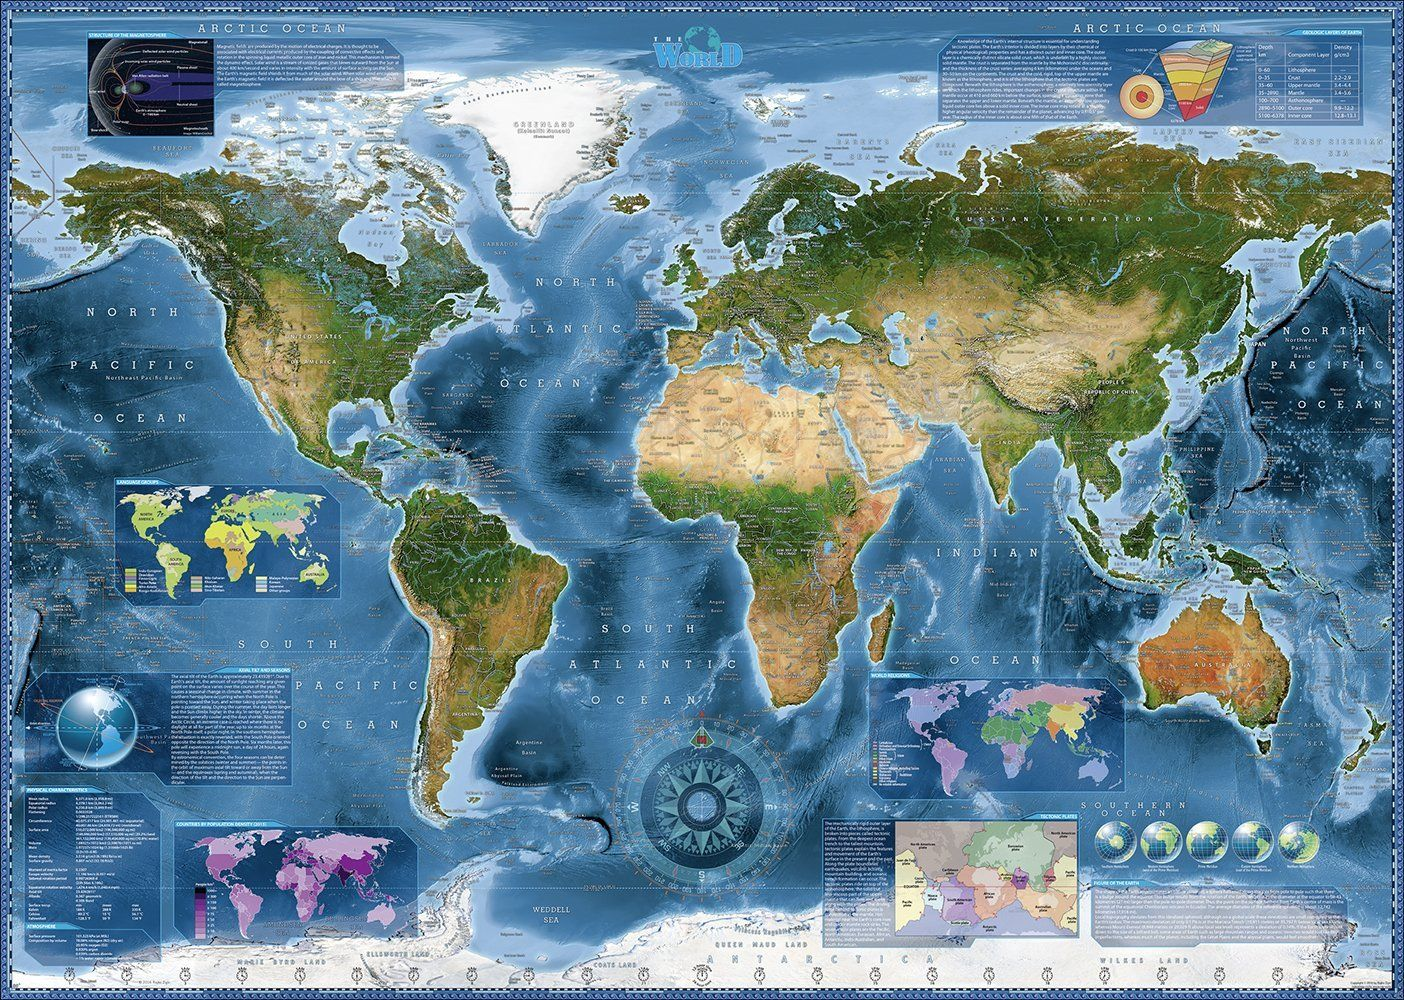 Pzel Heye Ot 2000 Chasti Satelitna Karta Na Zemyata Ozone Bg